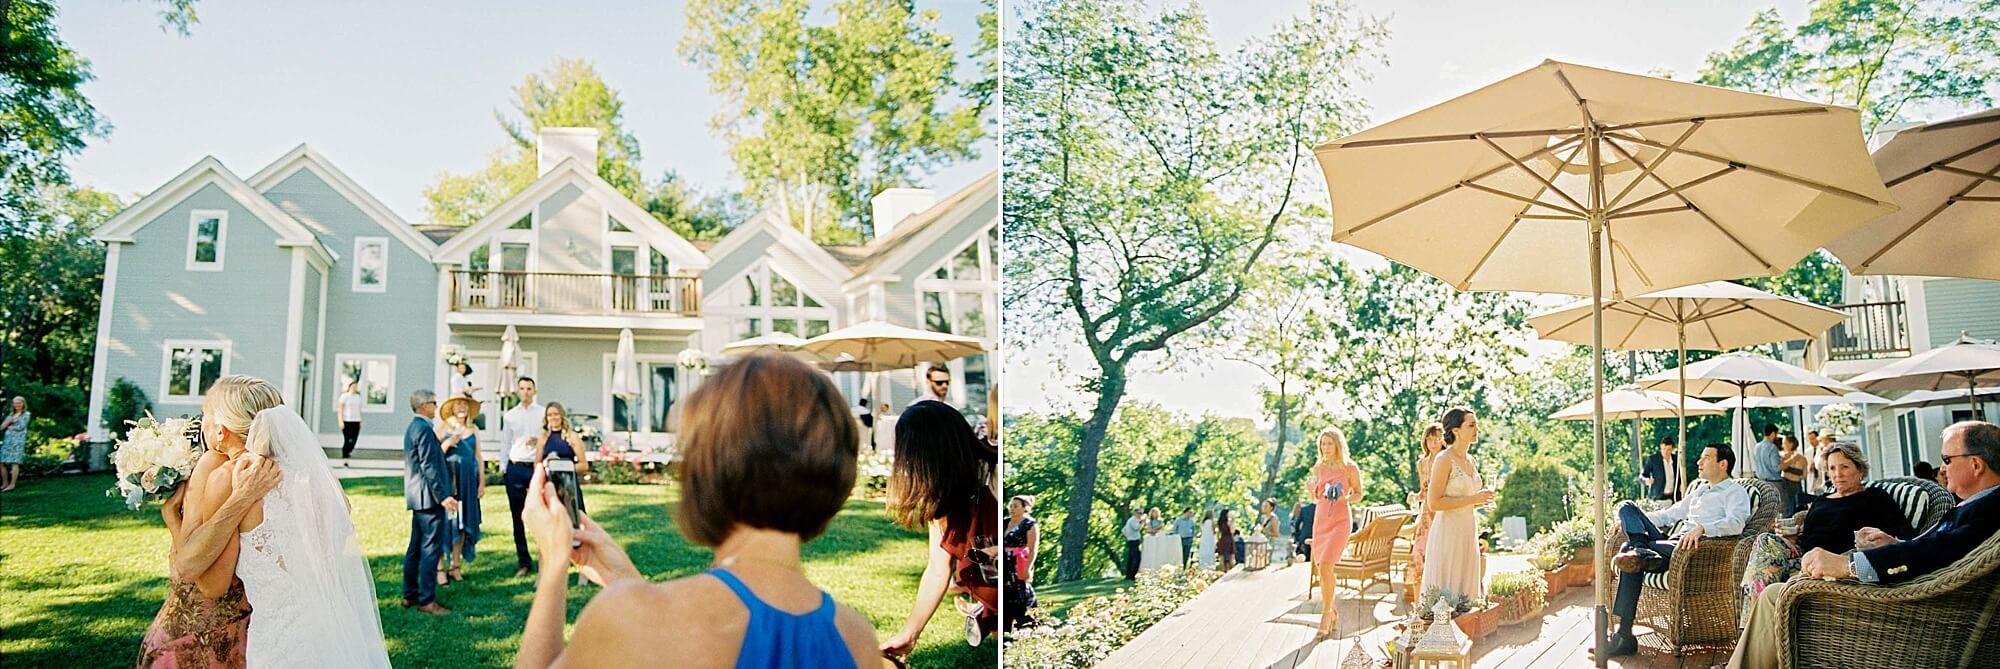 Backyard Wedding - MA_0074.jpg